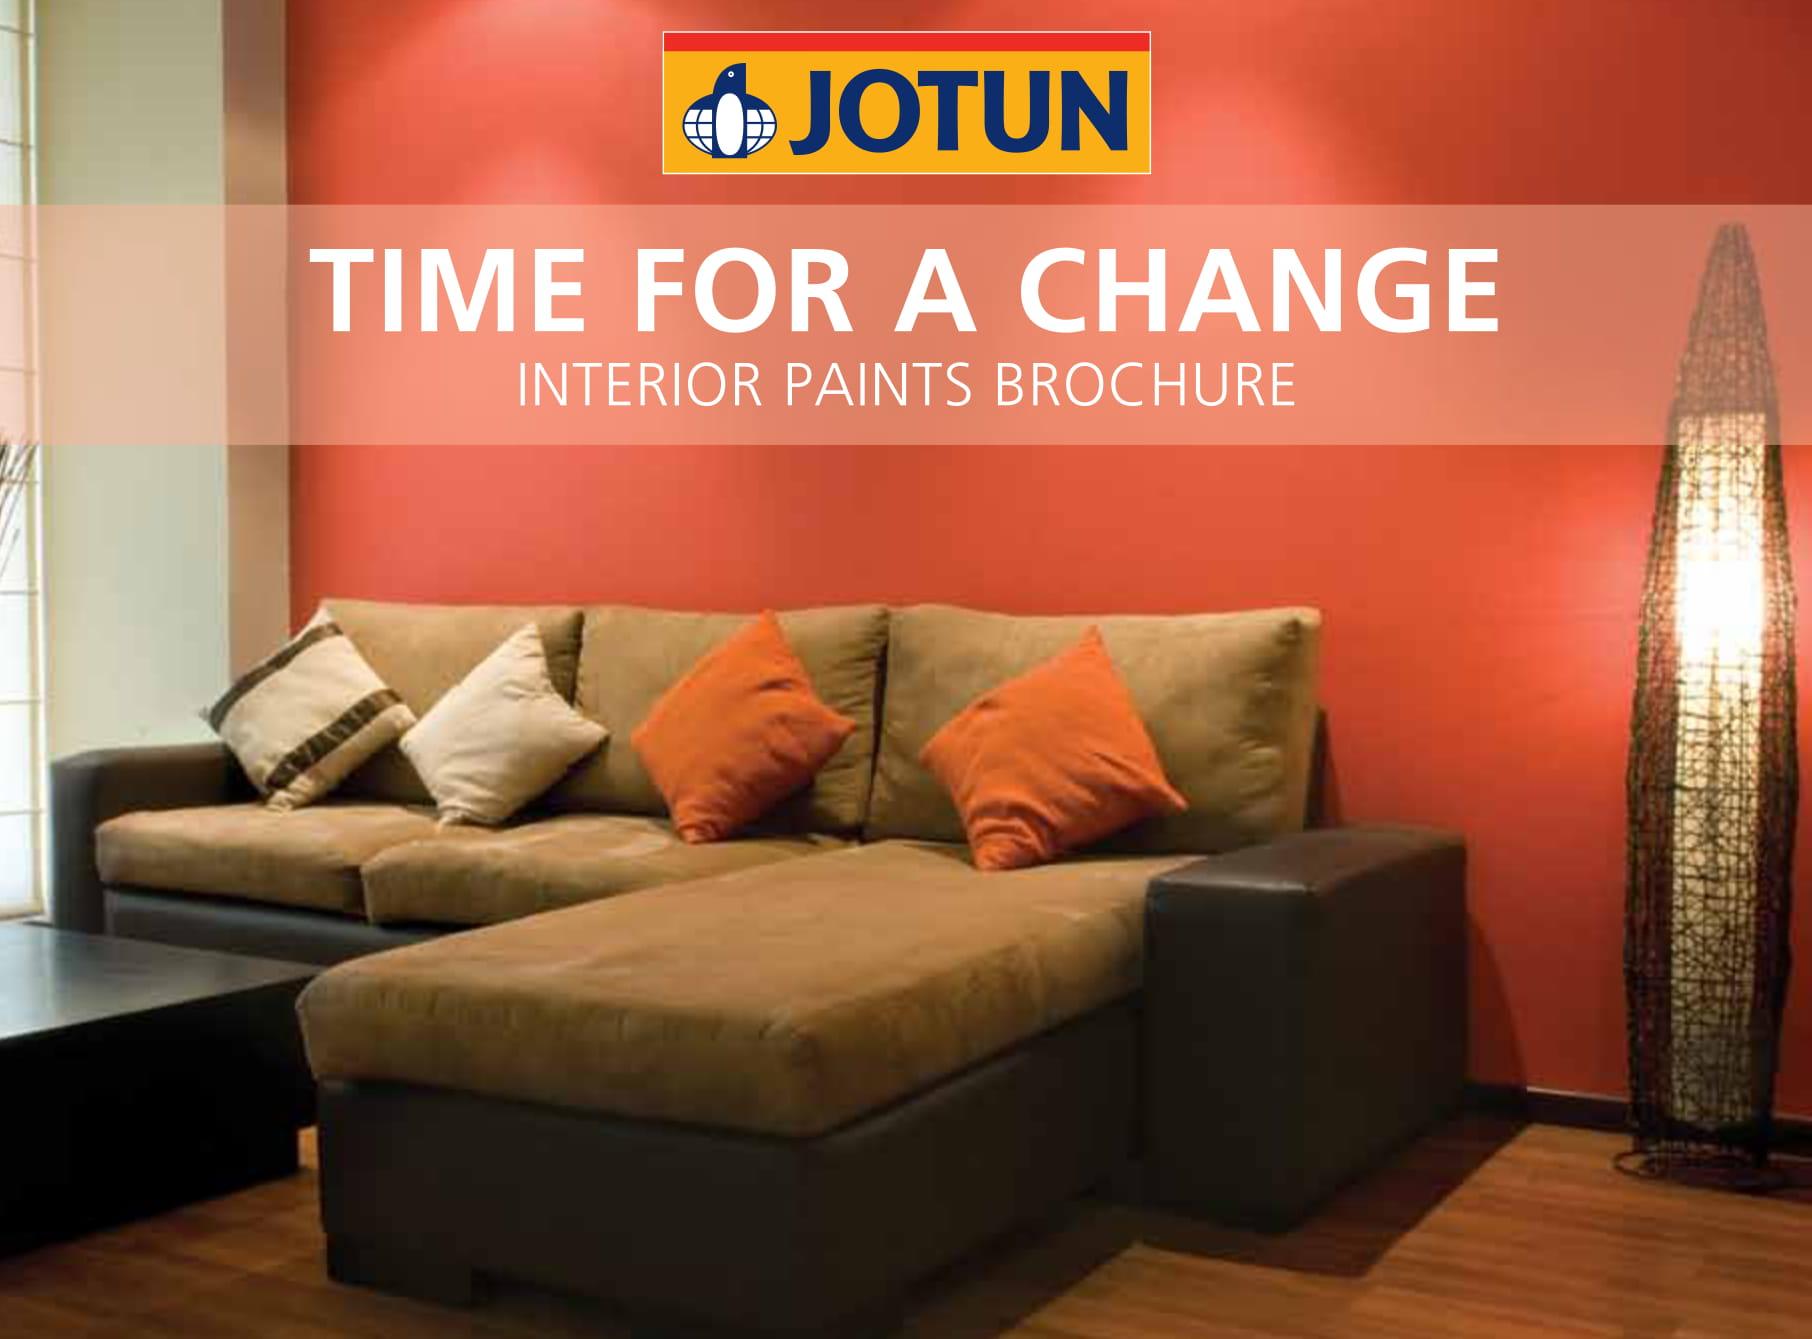 Interior Paints Brochure